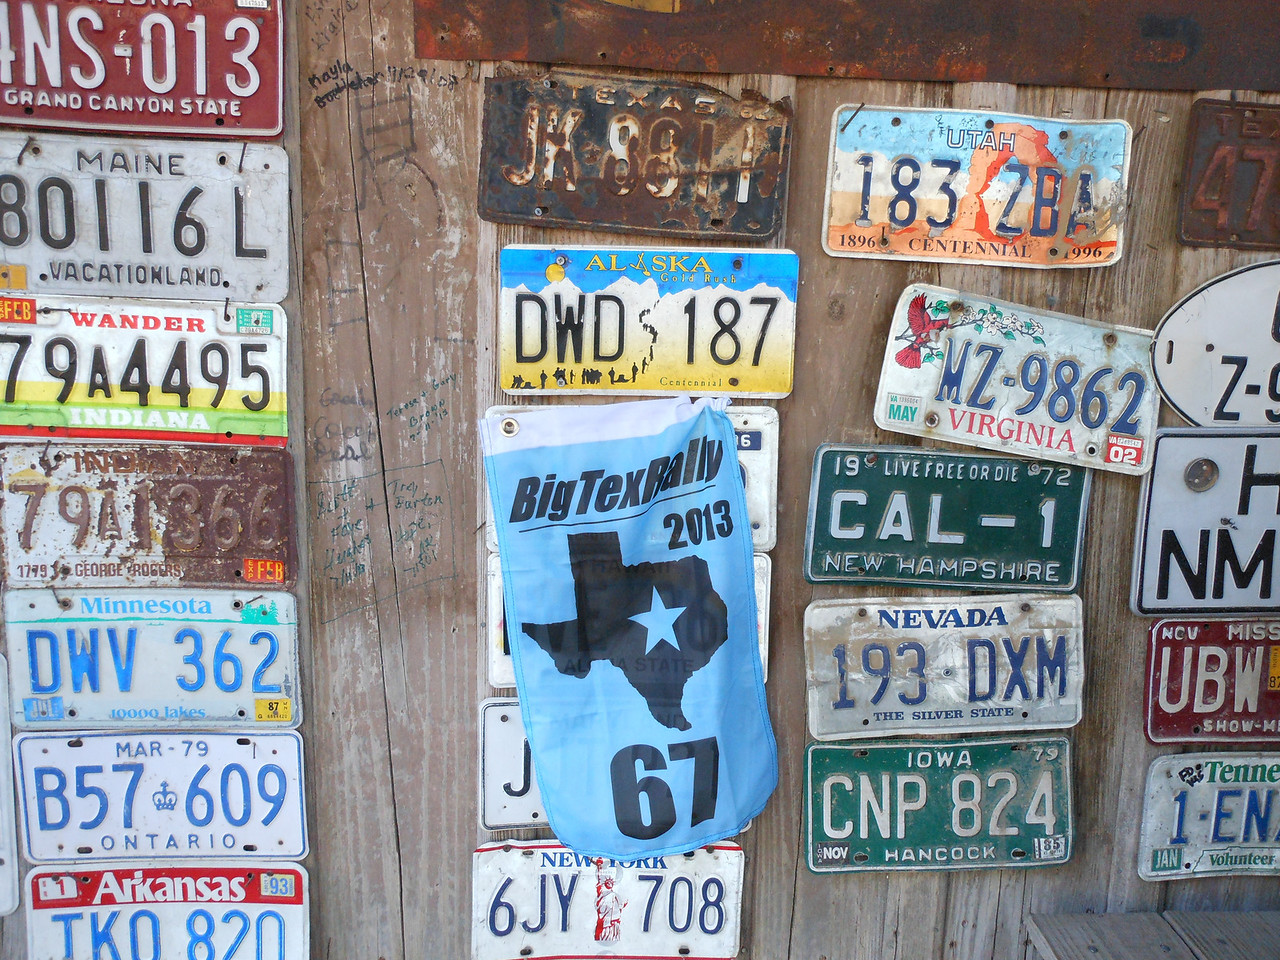 License Plate, a 500 point bonus